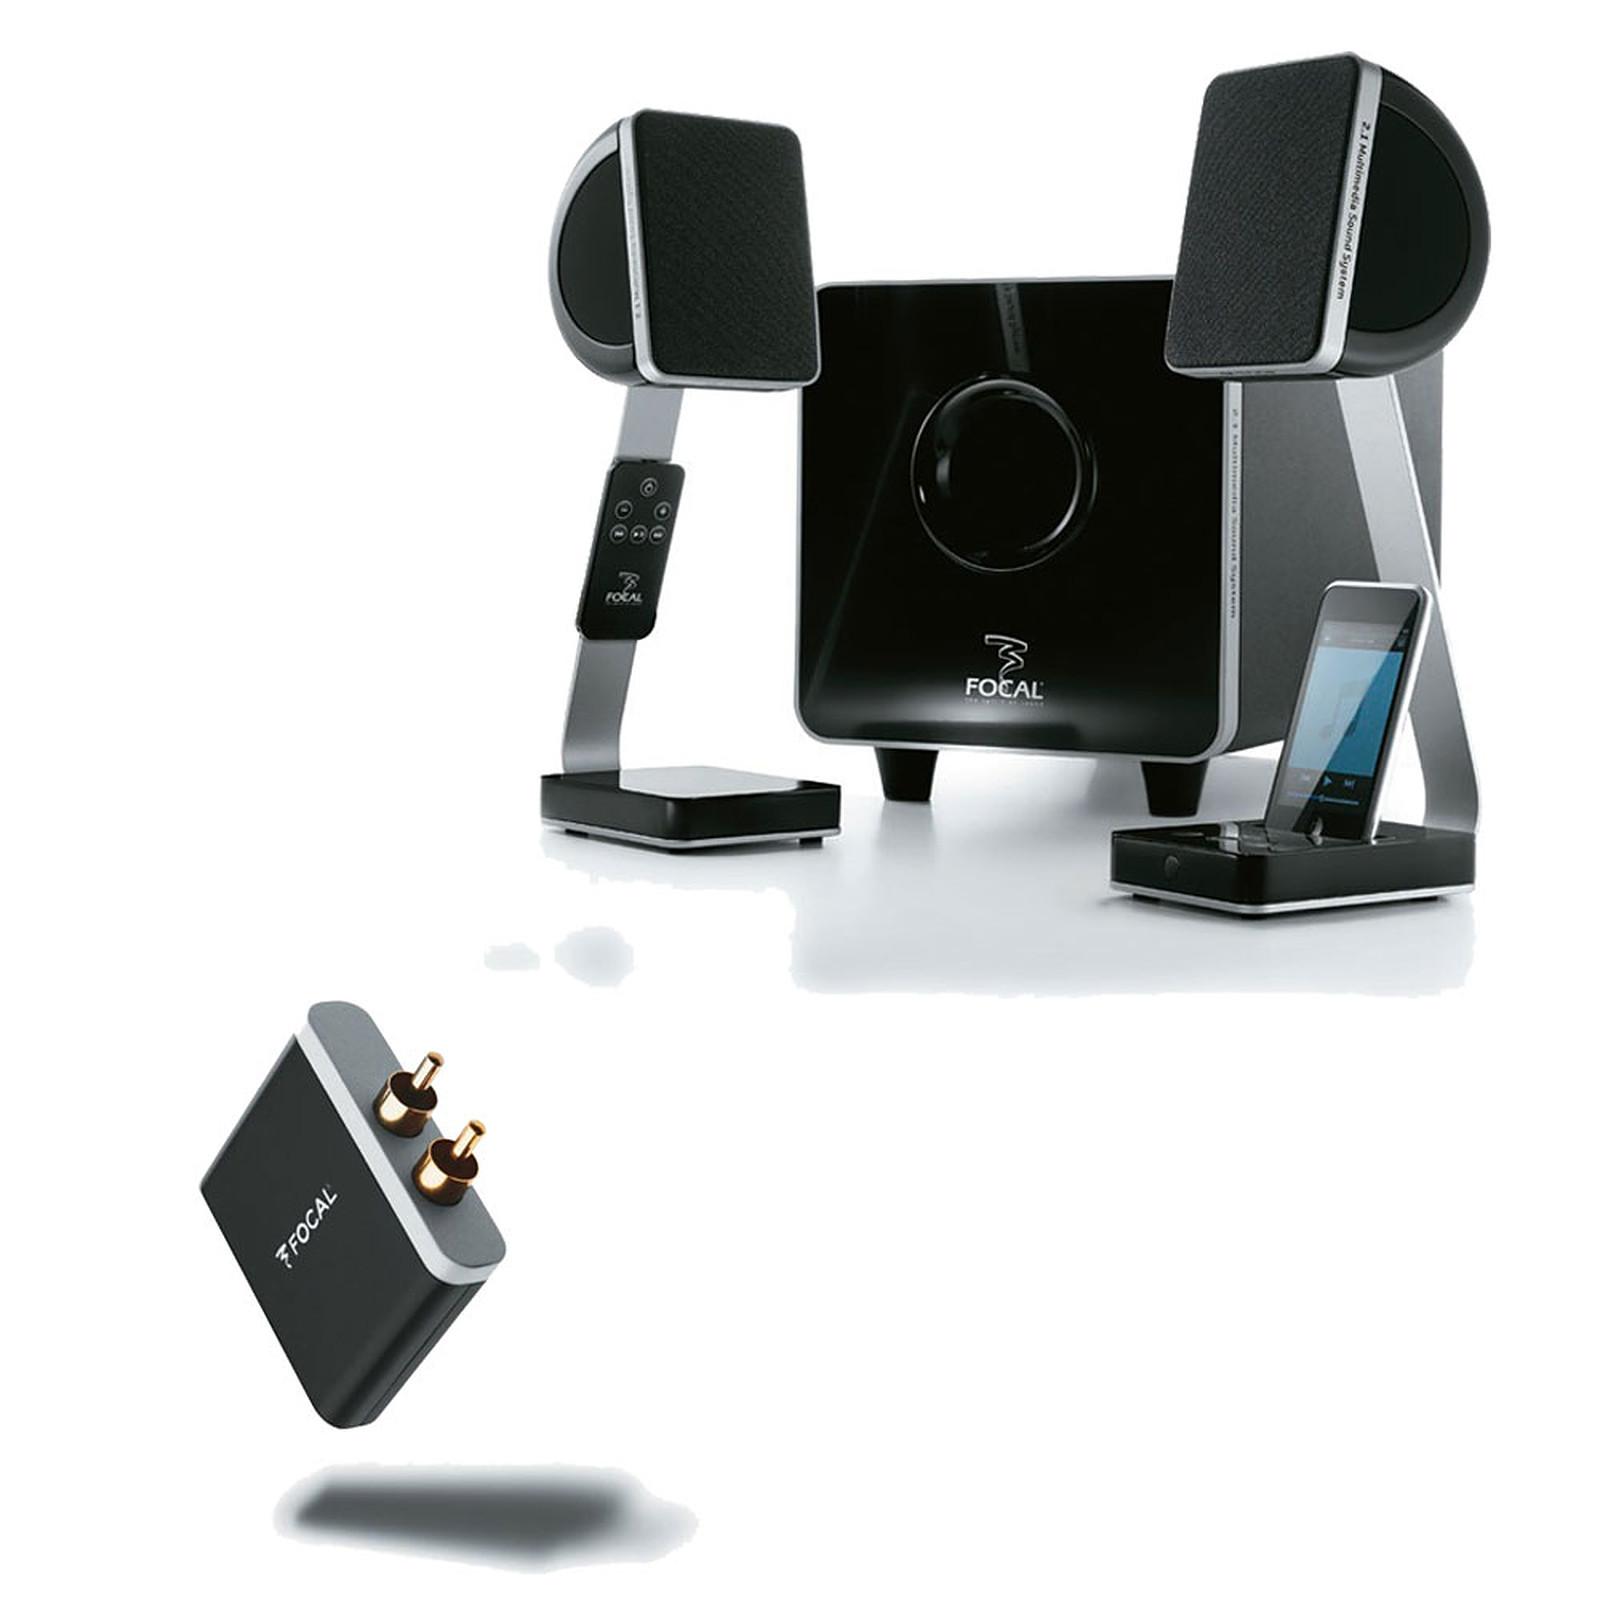 Focal XS + Focal Universal Wireless Receiver - aptX